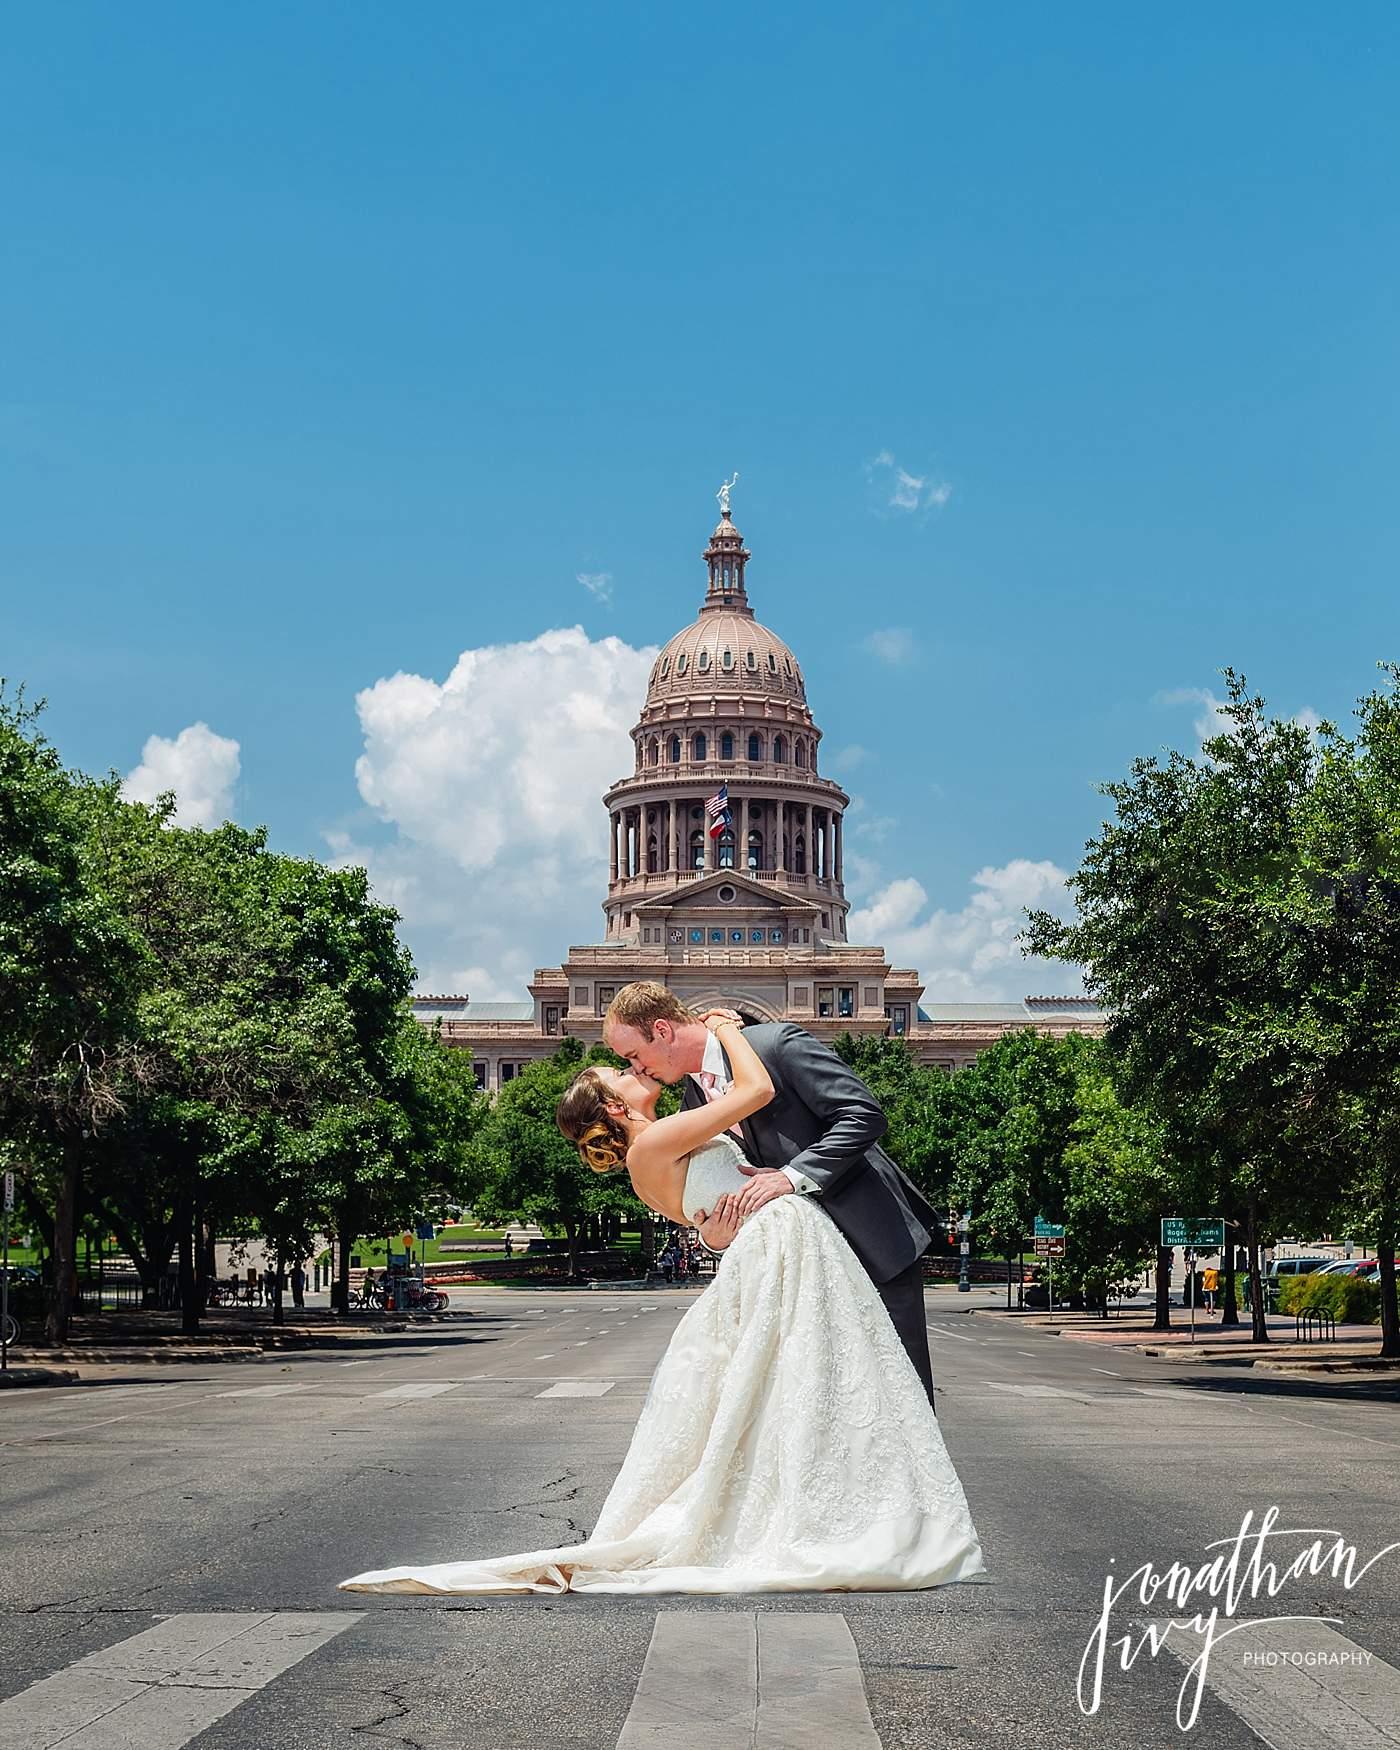 Austin Capitol Building Bride Groom Wedding Photo